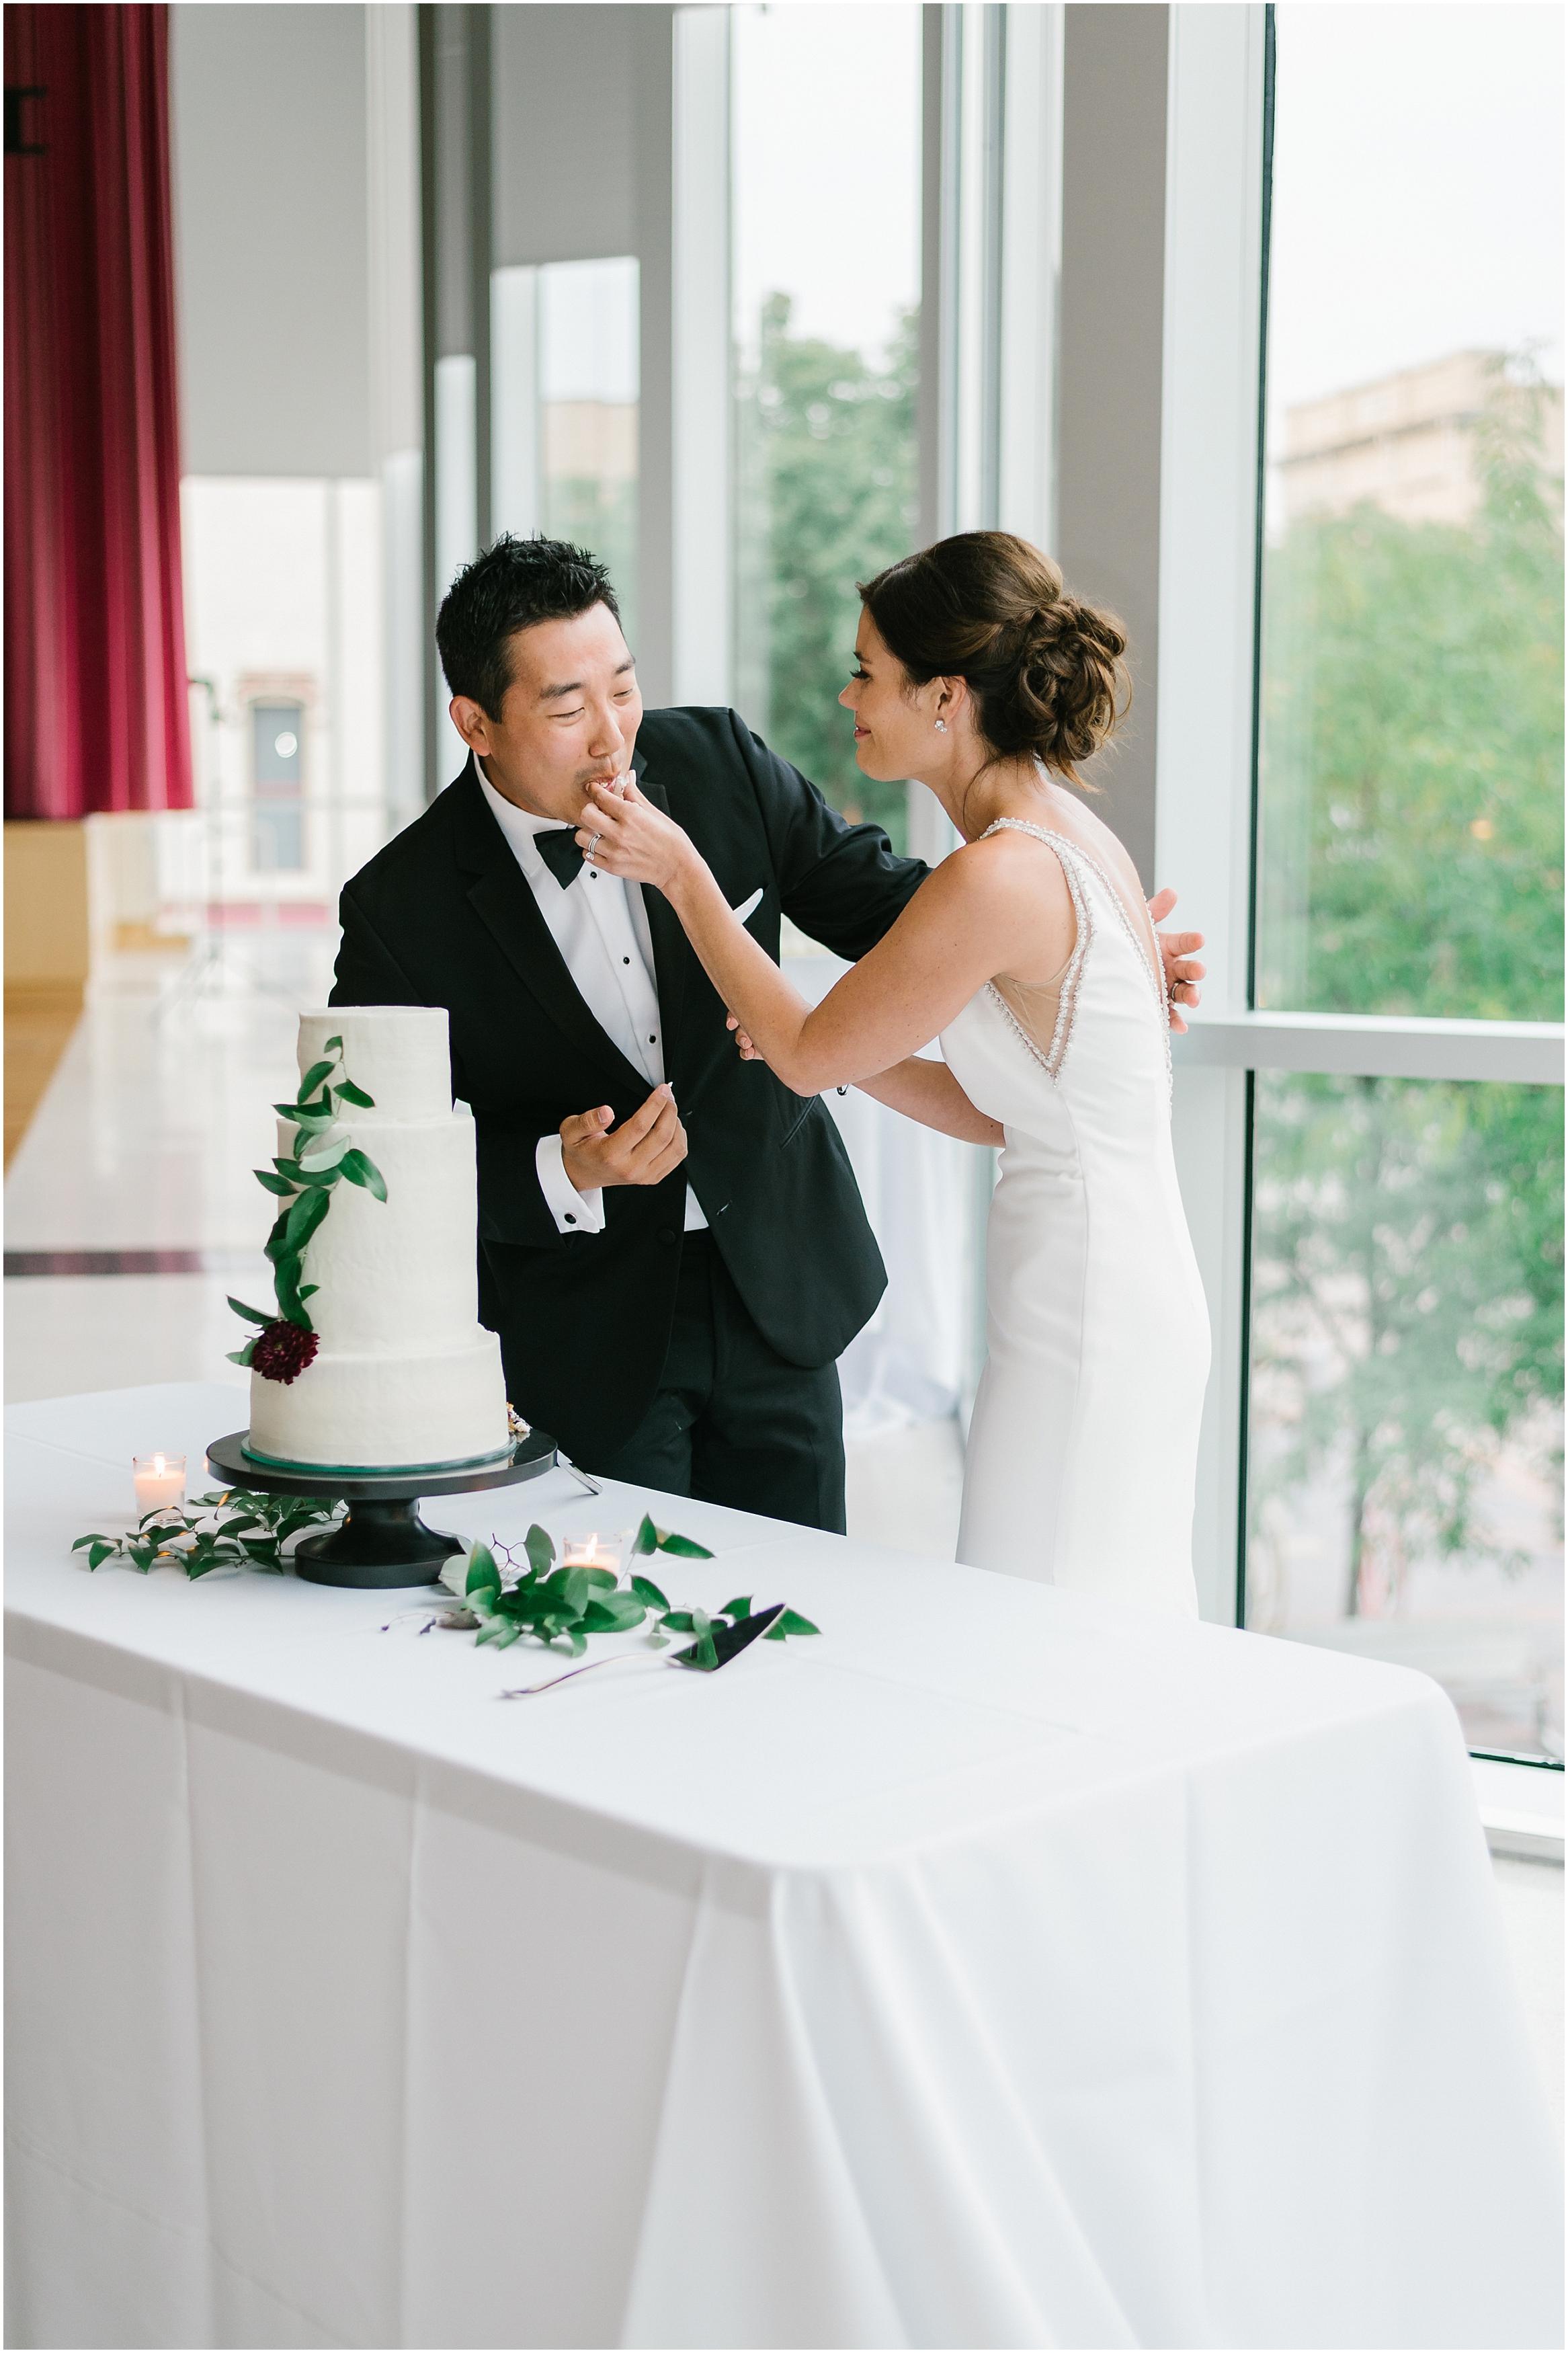 Rebecca_Shehorn_Photography_Indianapolis Wedding Photographer Sycamore at Mallow Run Wedding_9763.jpg